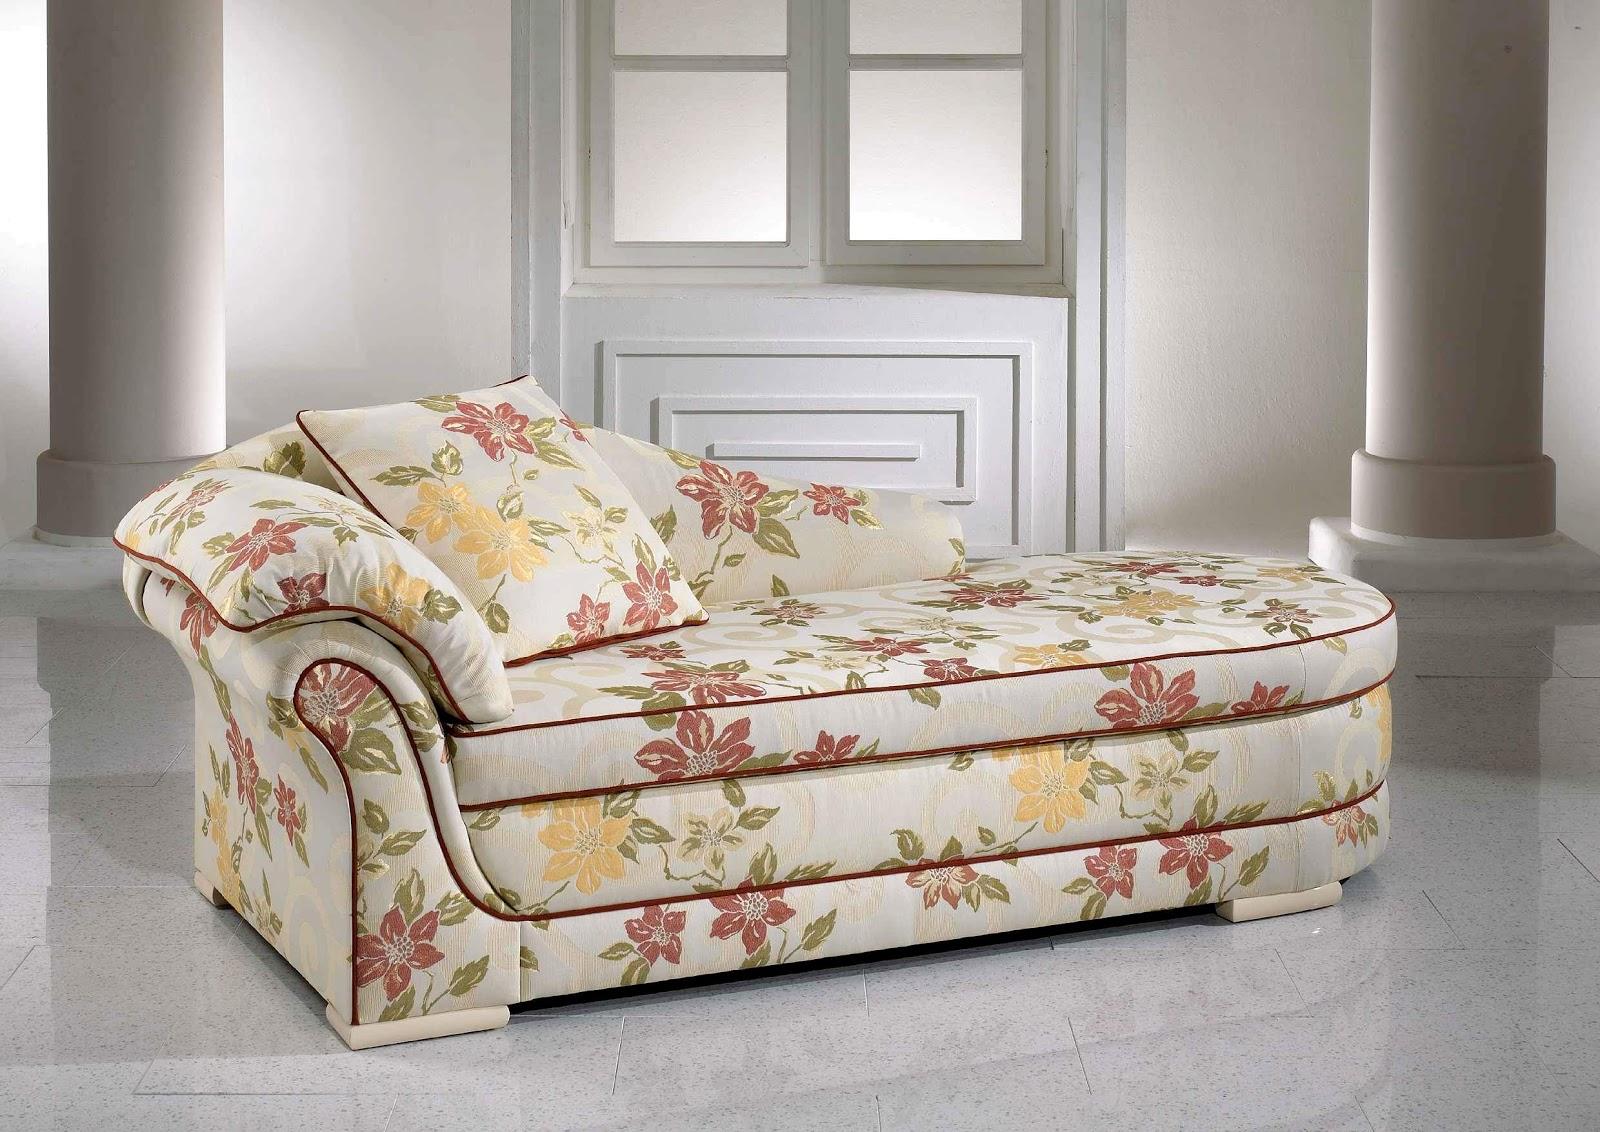 Sofa design 15 arrangement - Home sofa design ...